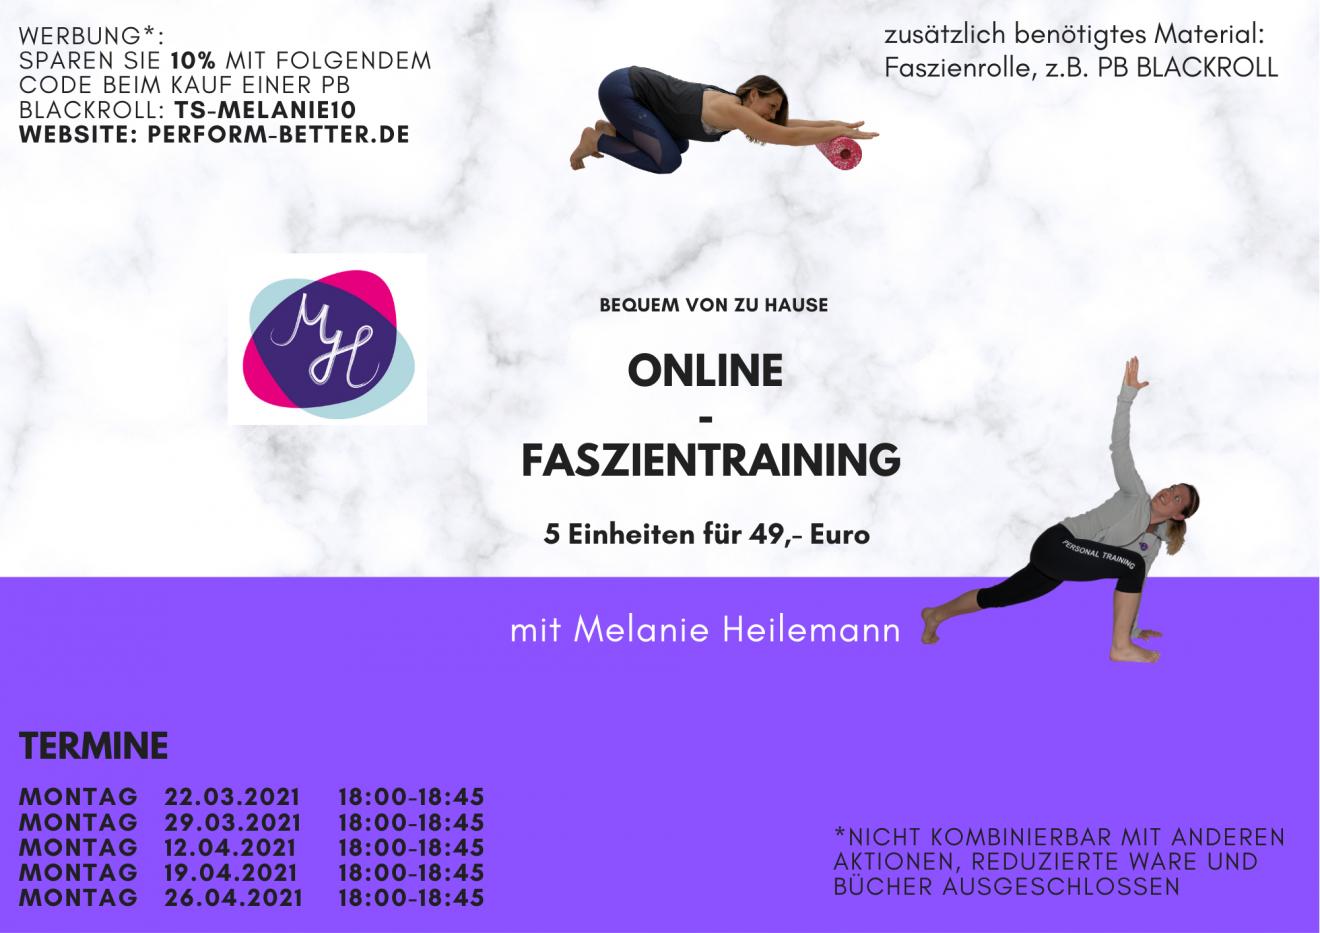 Online-Faszientraining März 2021